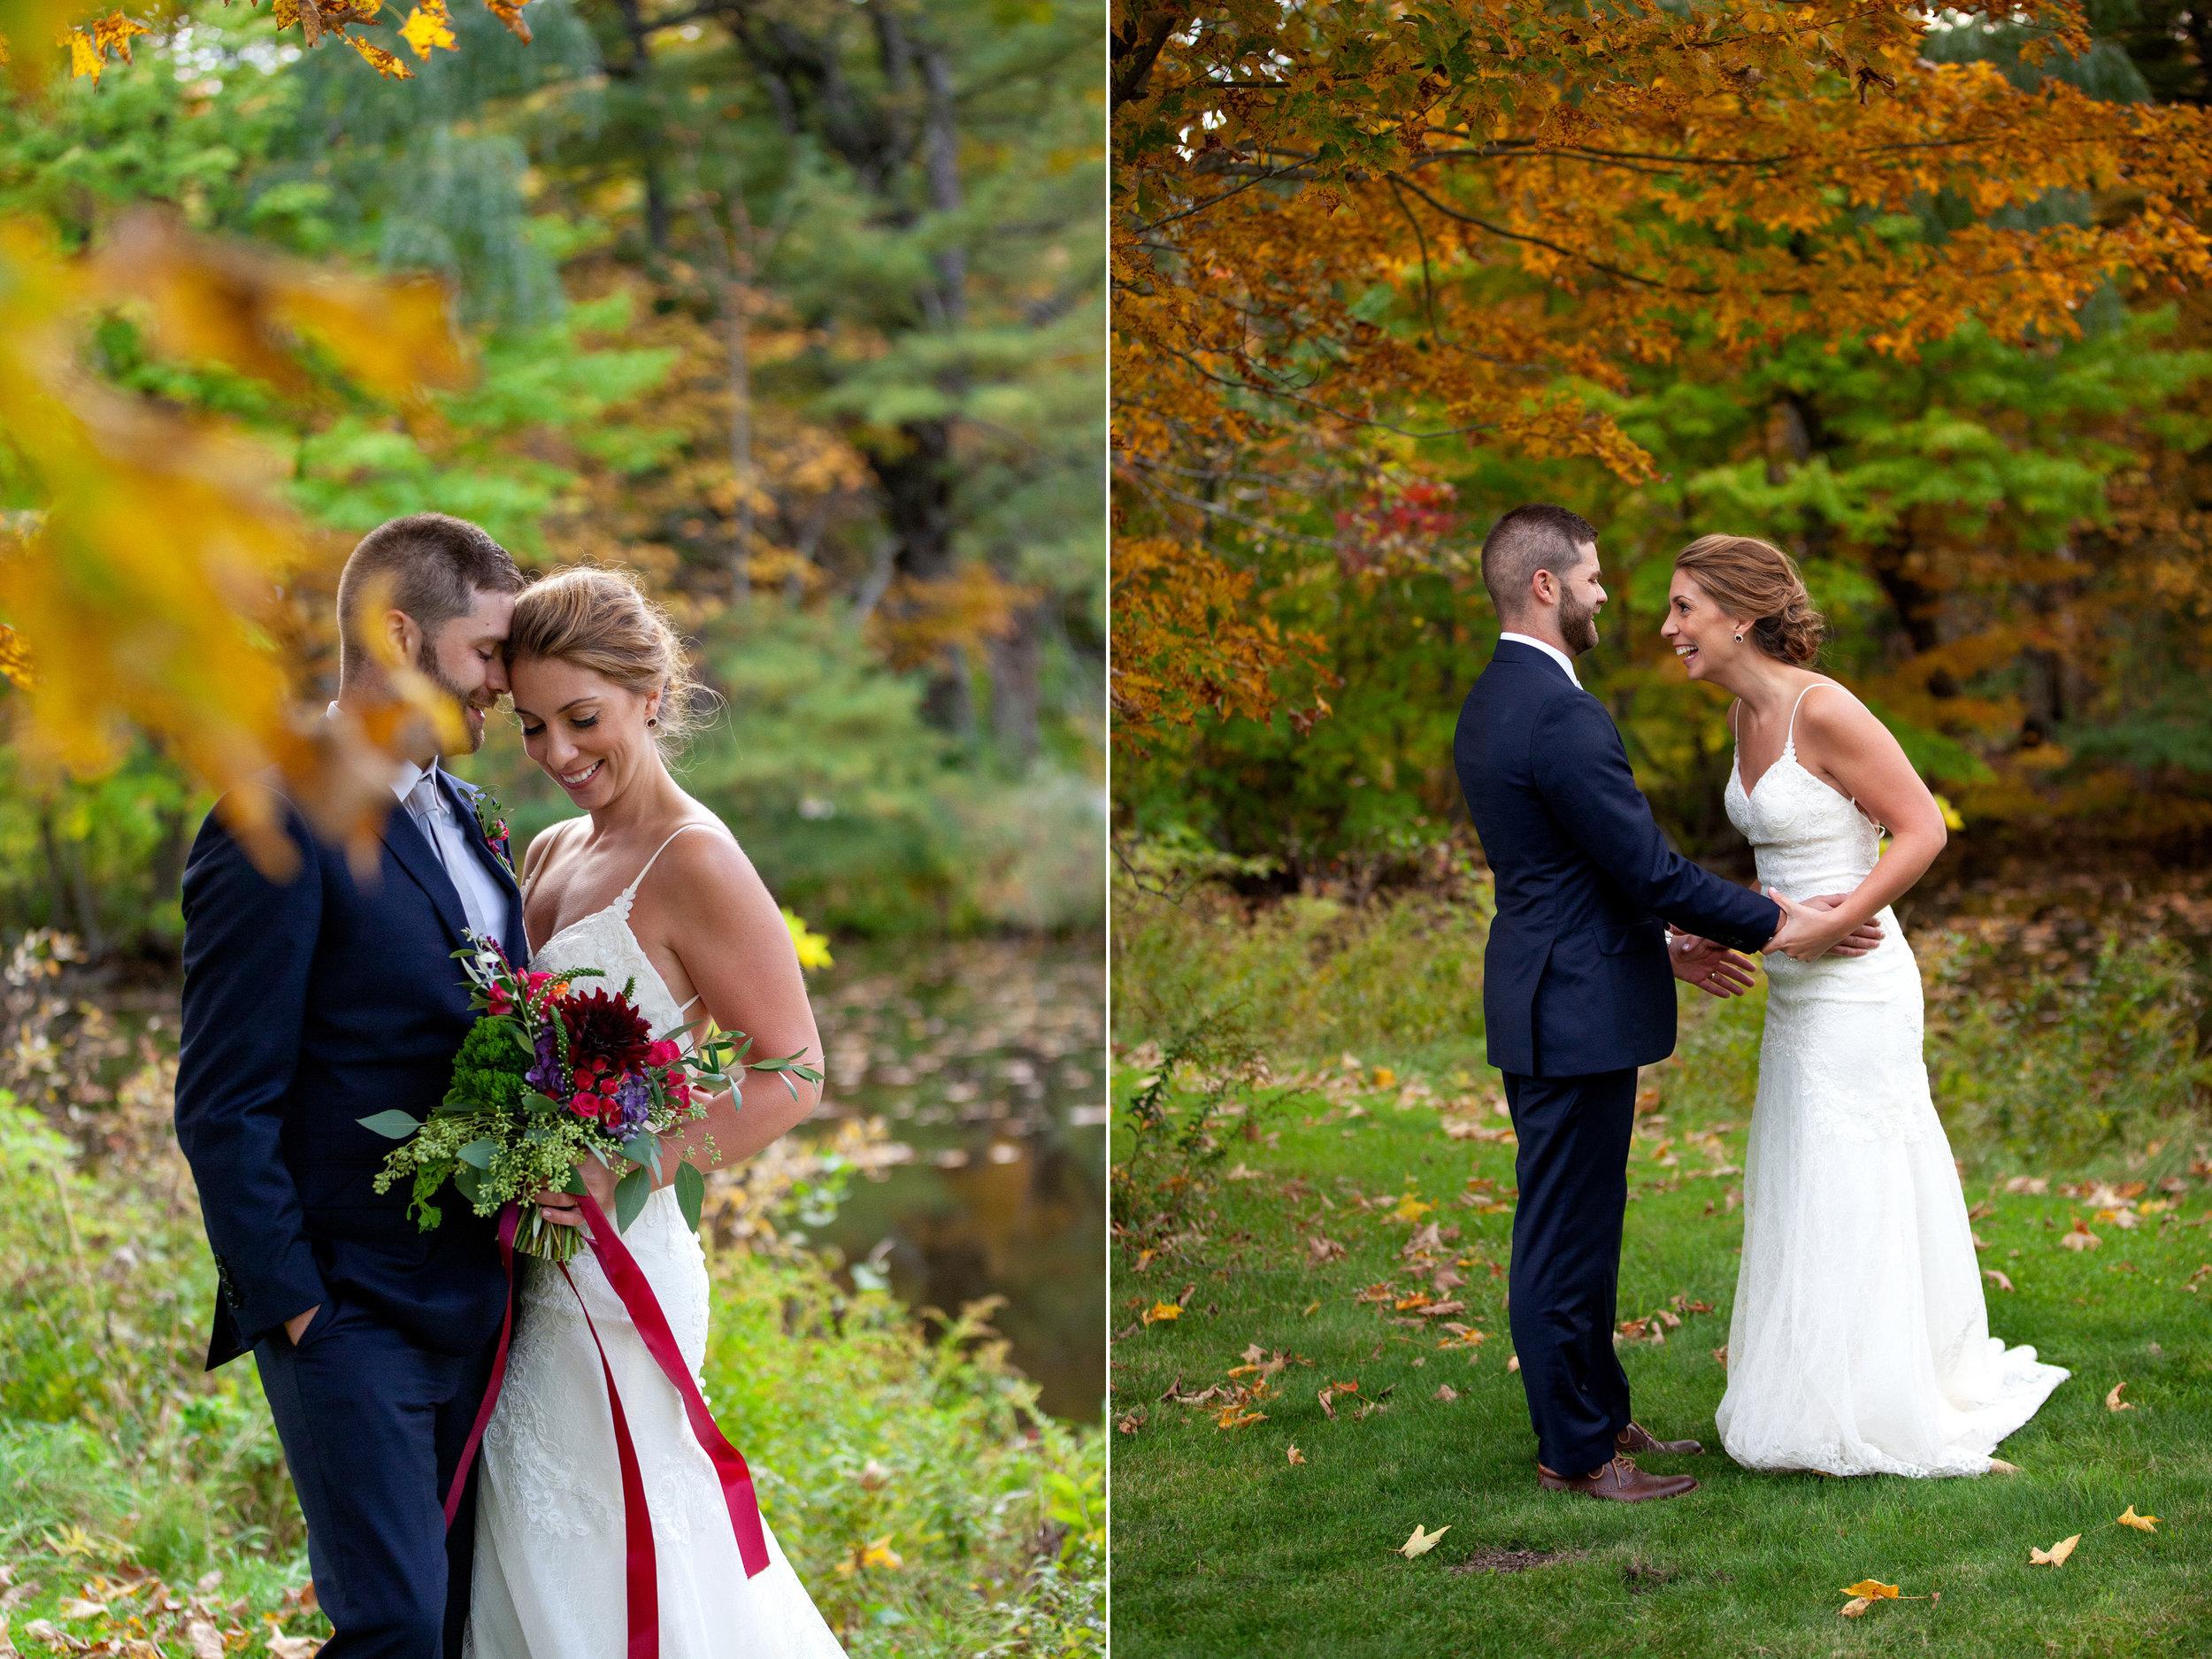 maine-farm-wedding-photographer-stepheneycollins-259b.jpg